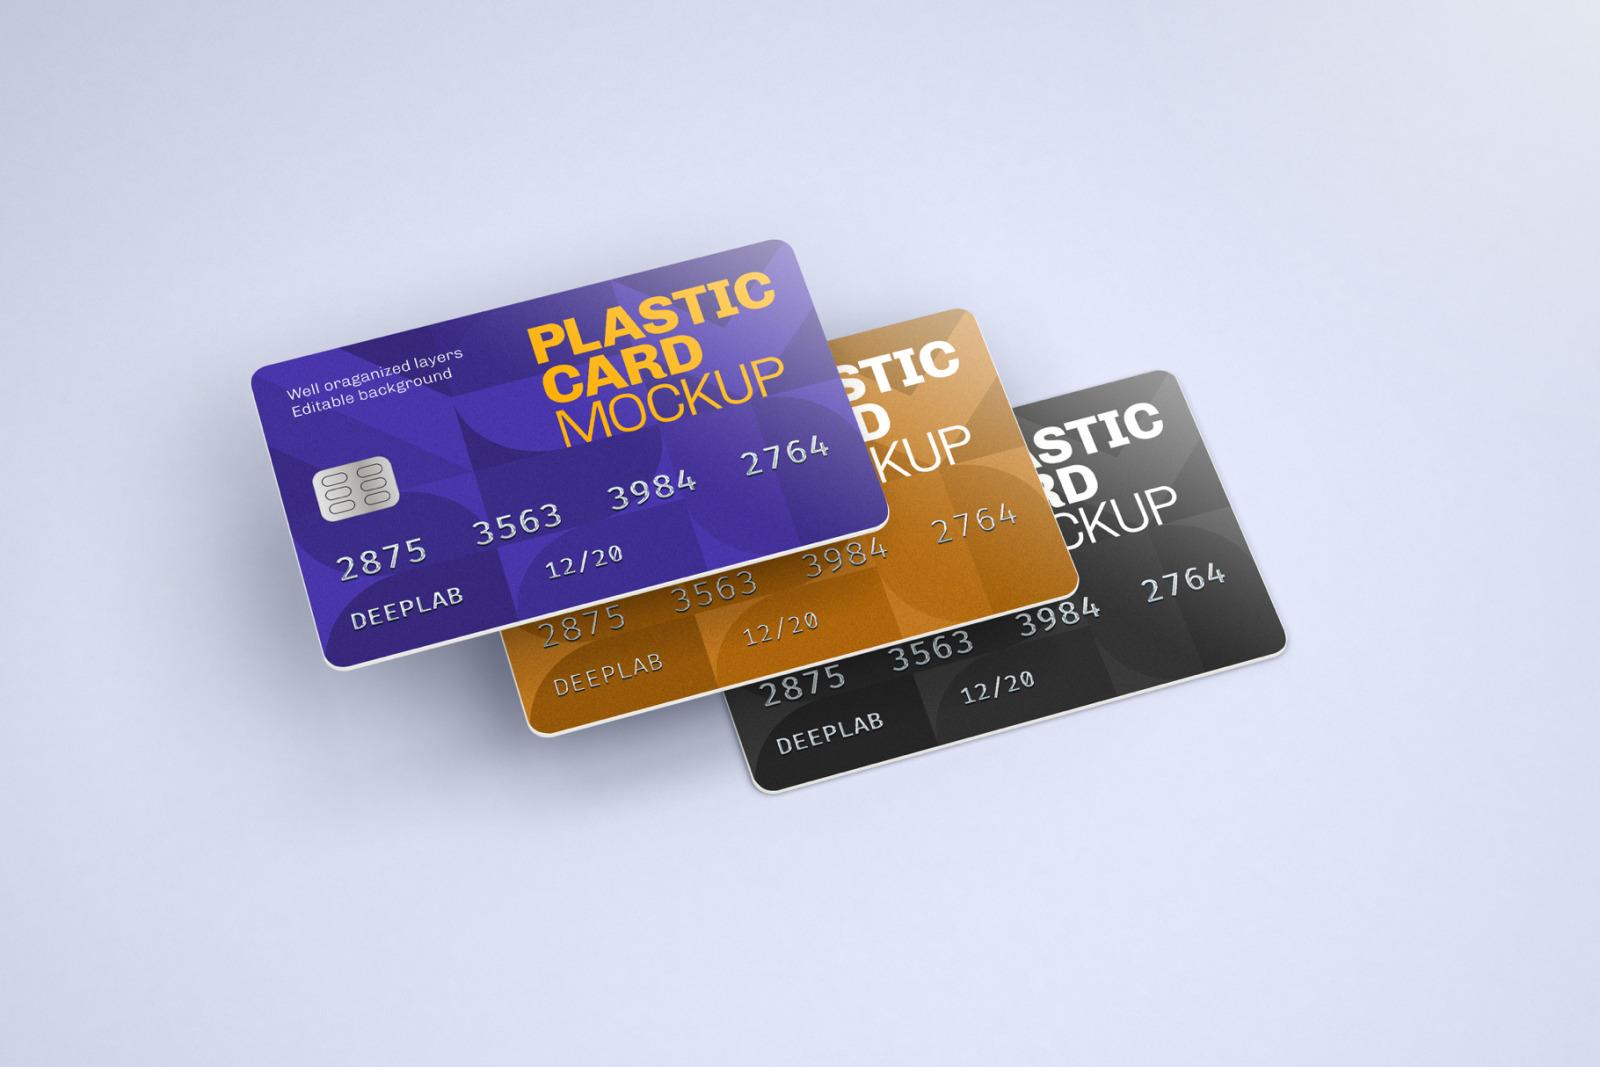 Plastic Card Mockup Set - 21 styles